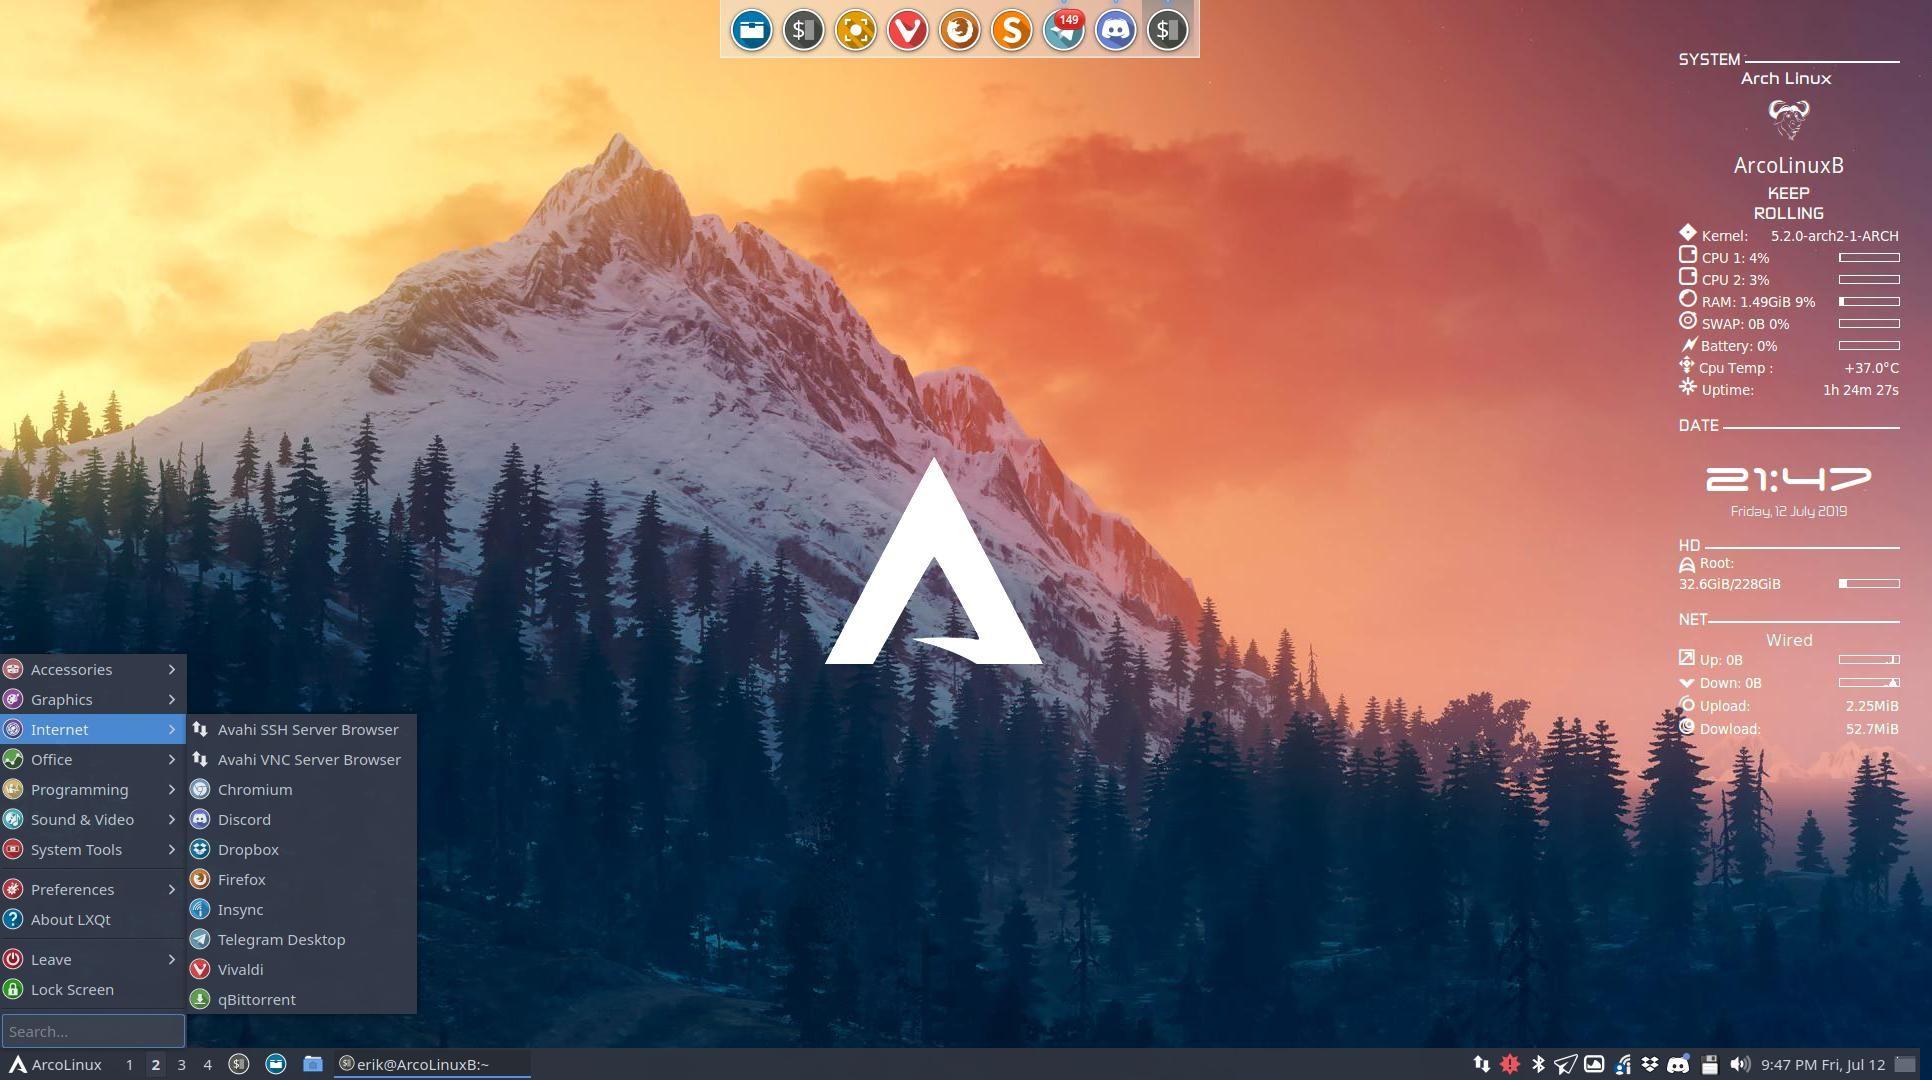 ArcoLinux releases a new desktop : LXQt